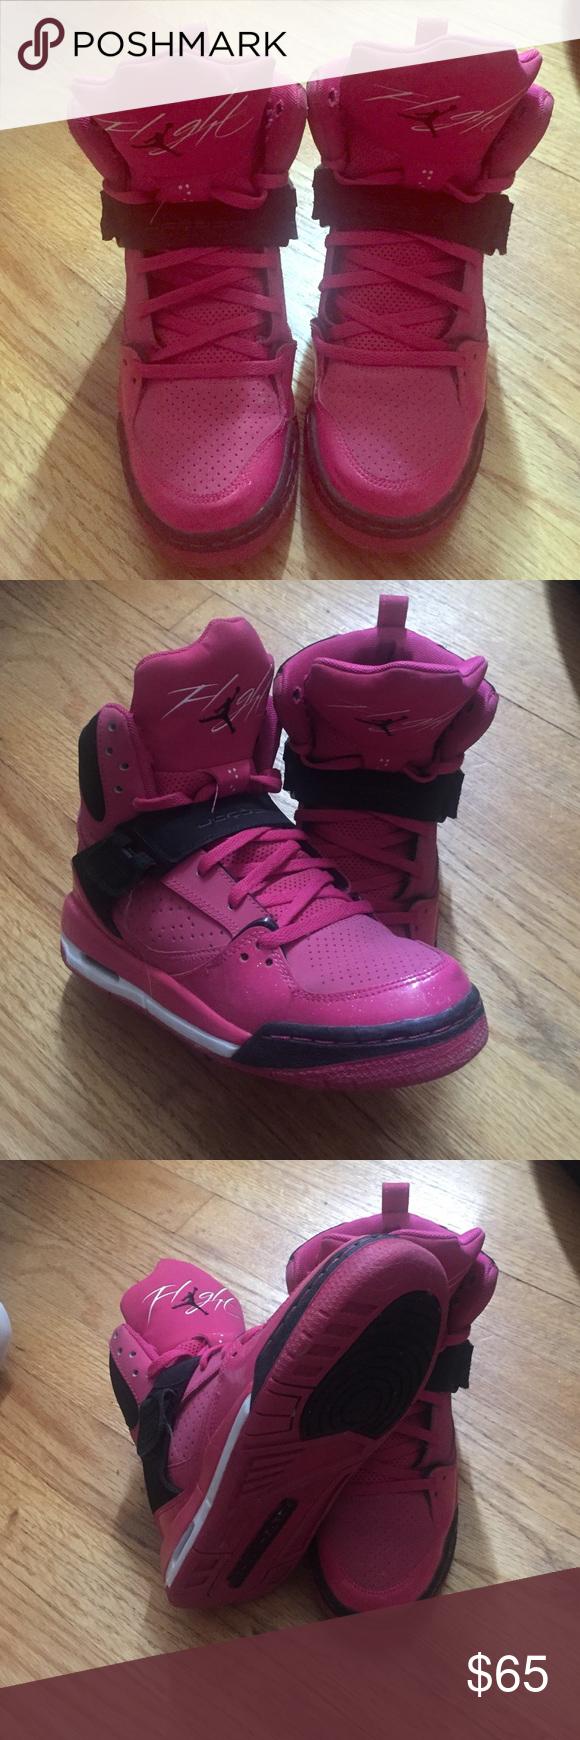 Jordan Flight -hot pink & black- Size 6 - Jordan Flight - hot pink & black - very good condition - Jordan Shoes Sneakers